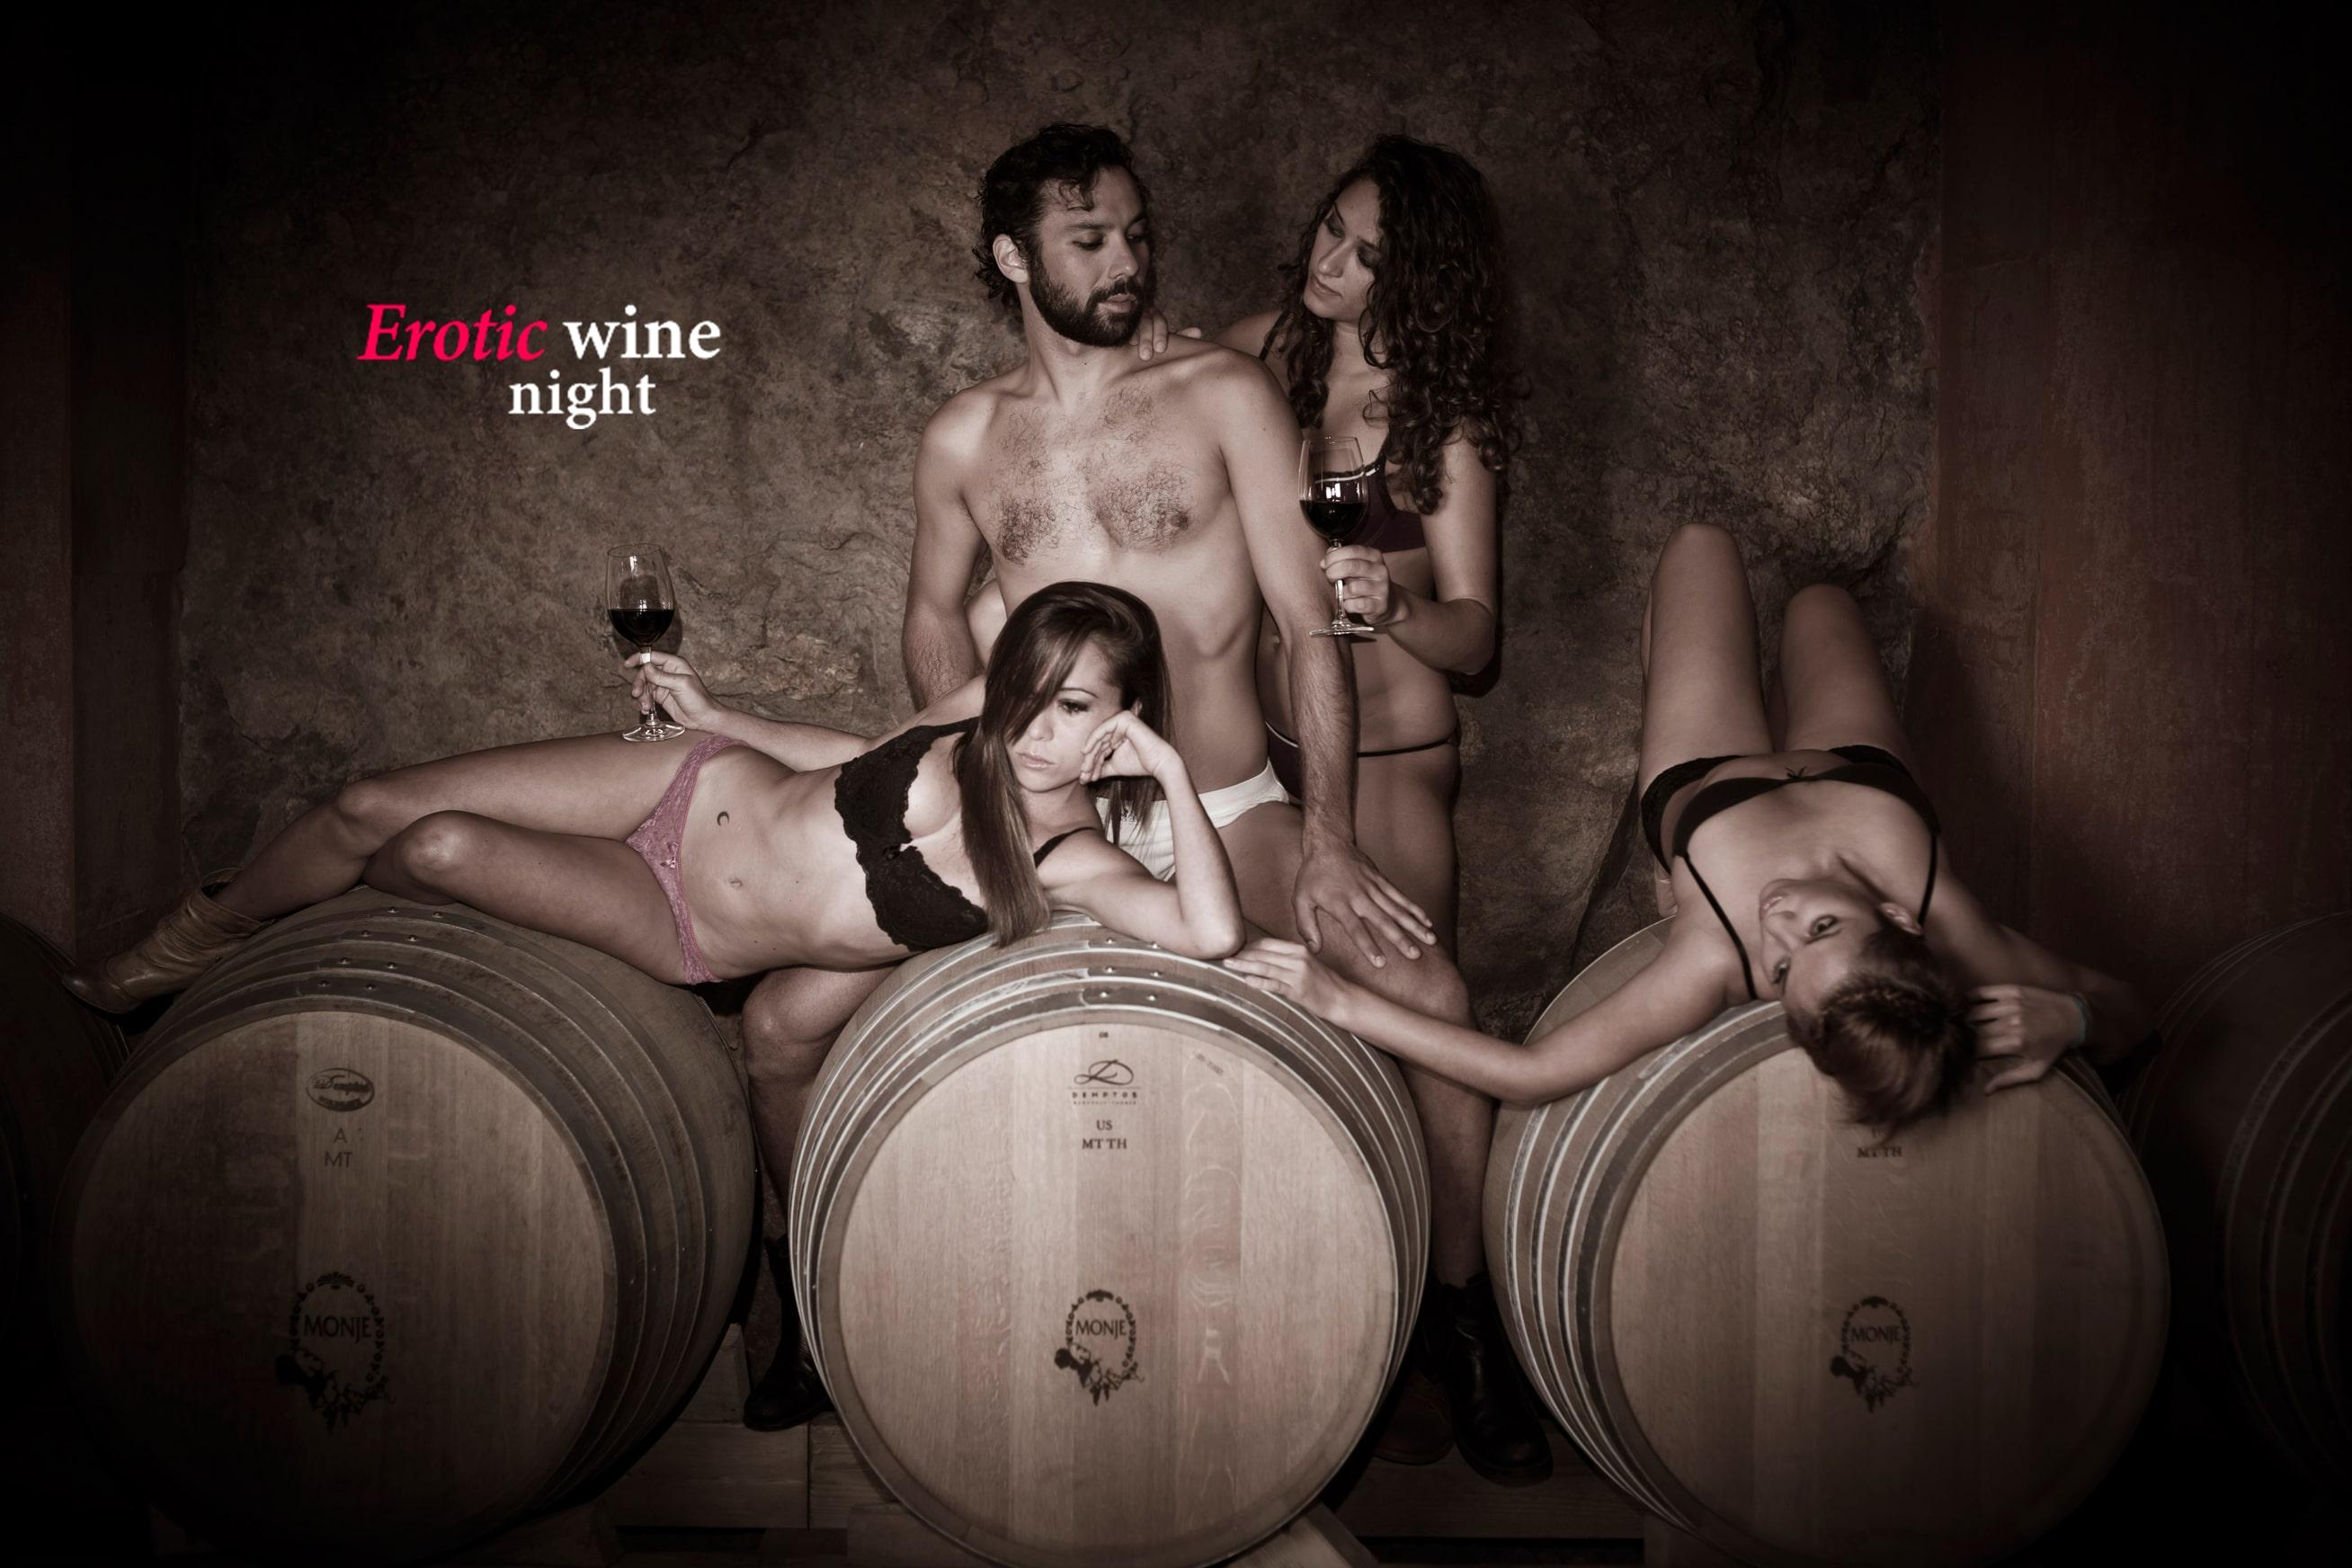 Wineandsex2